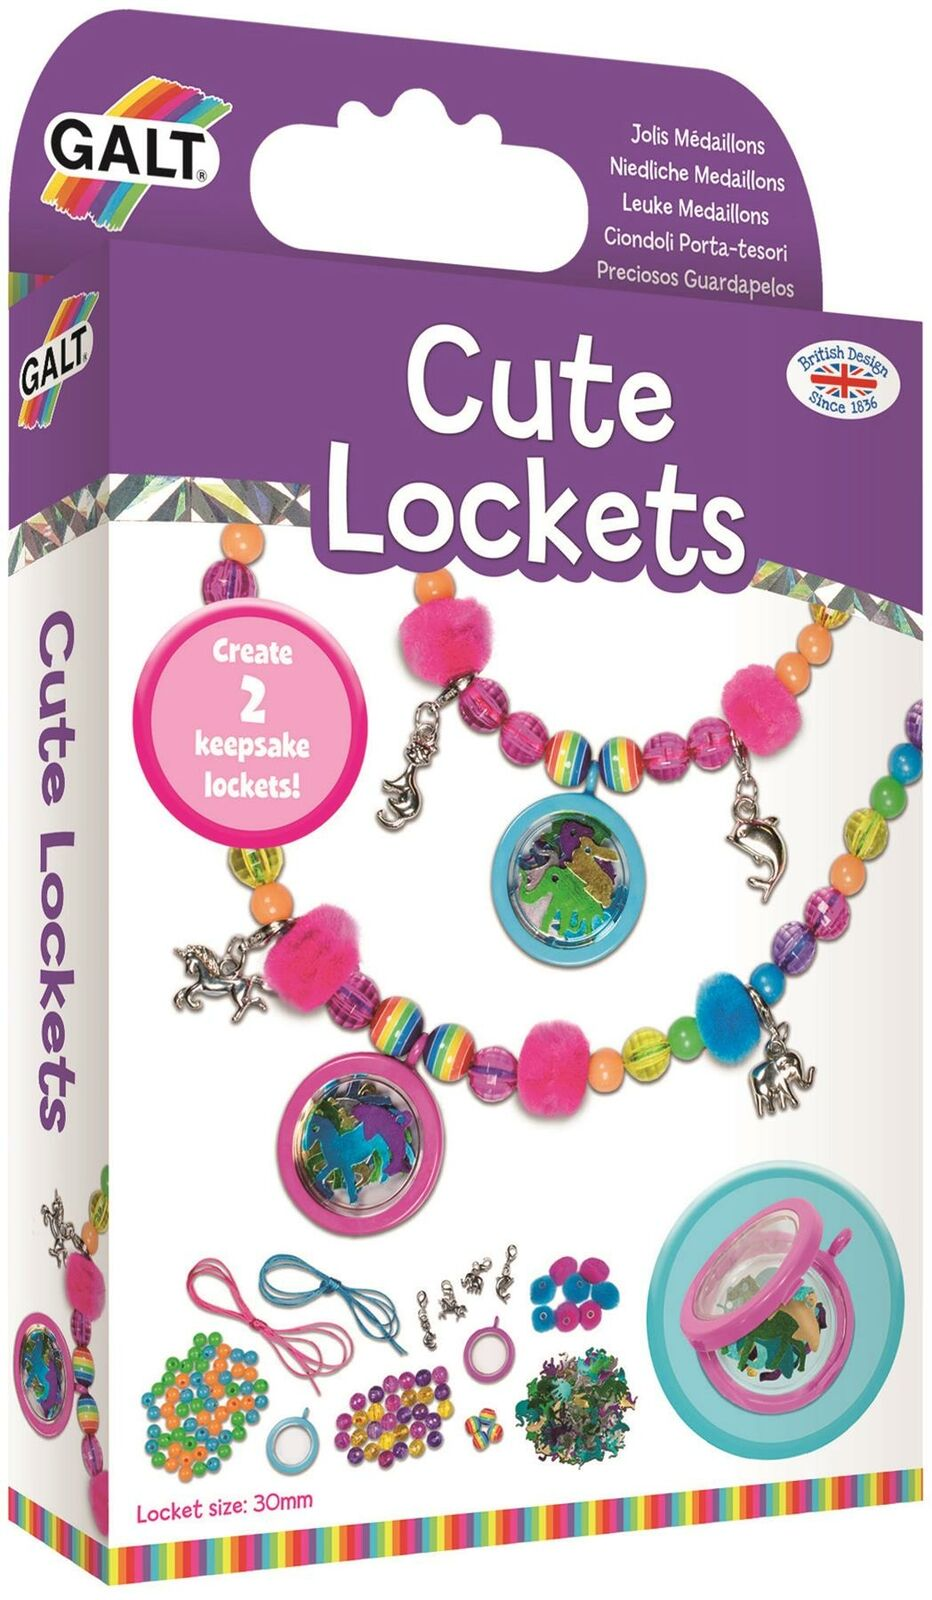 Galt SENSATIONAL SEQUINS FAIRIES AND UNICORNS Kids Art Craft Toy BNIP